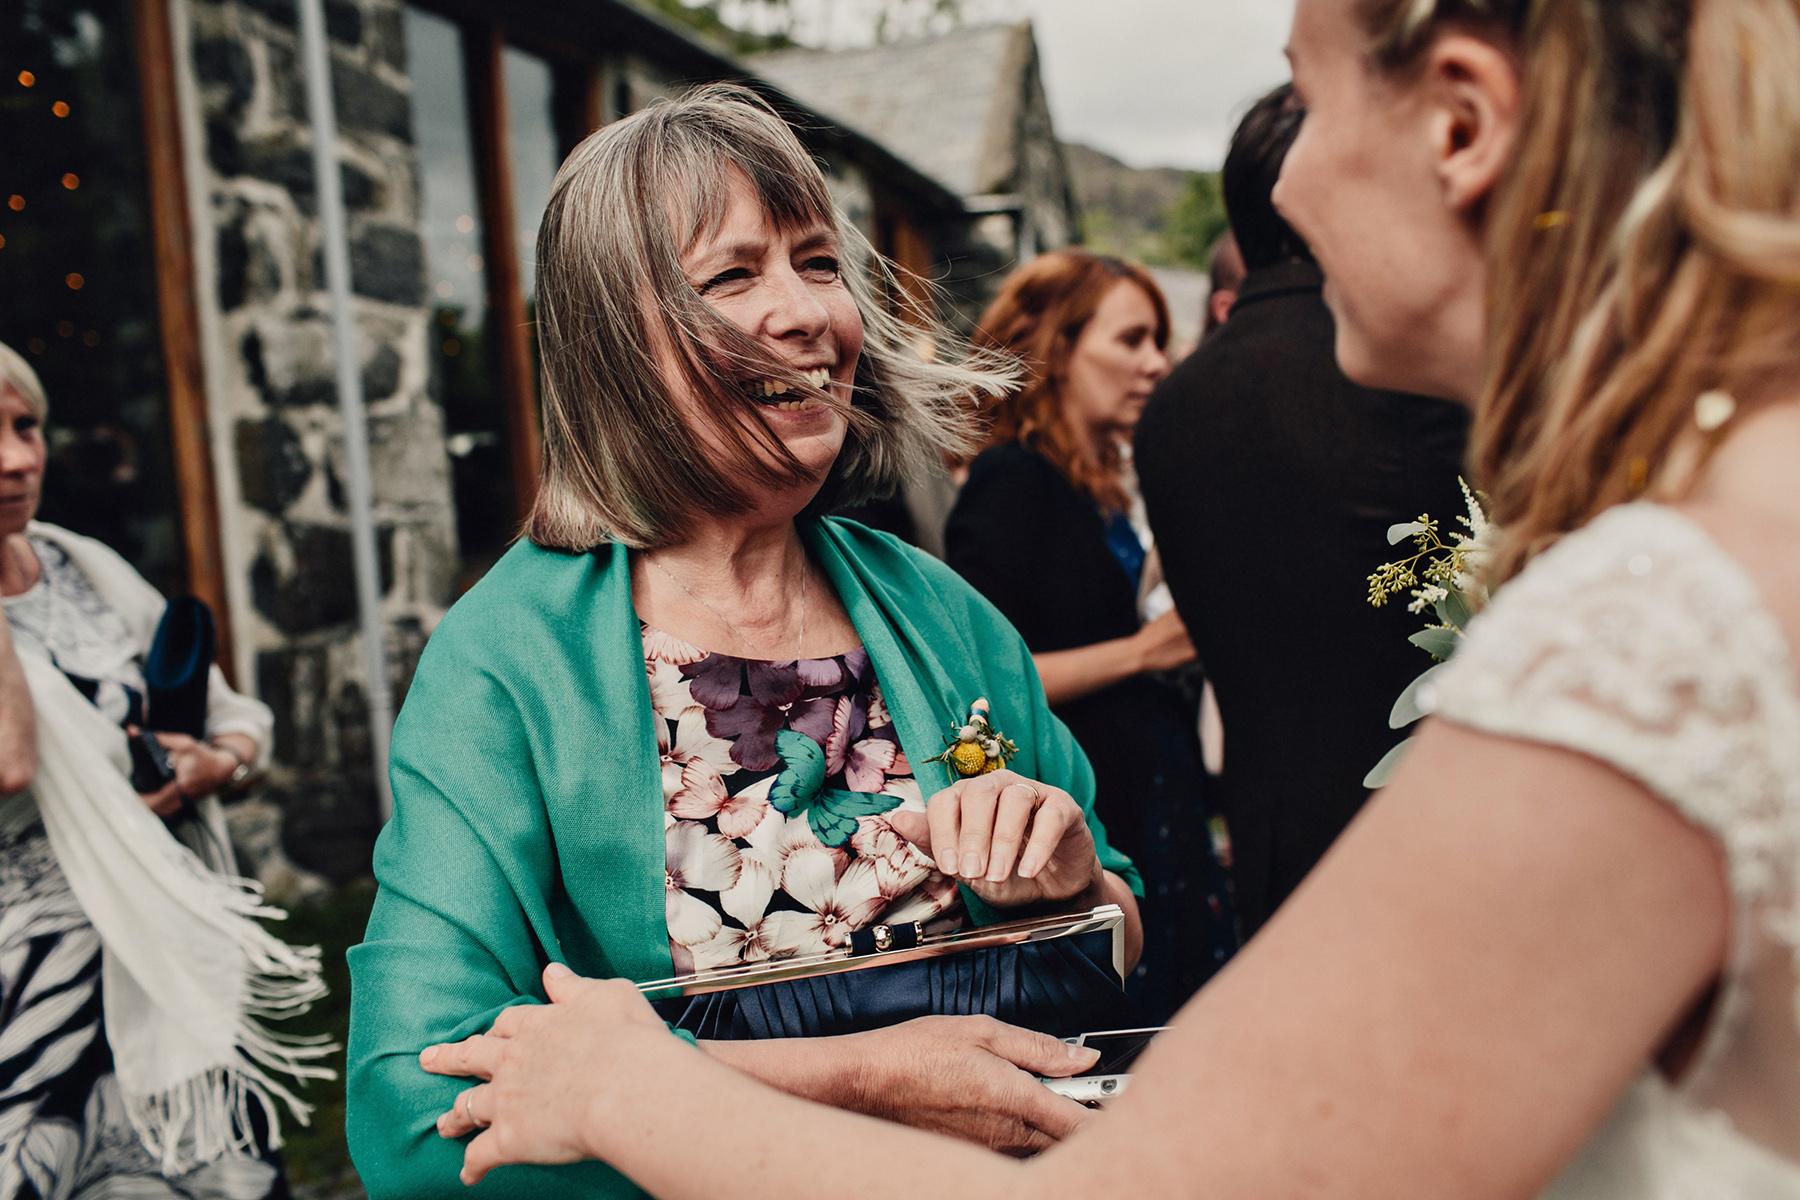 Snowdonia-Wales-Wedding-Photos-0340.jpg